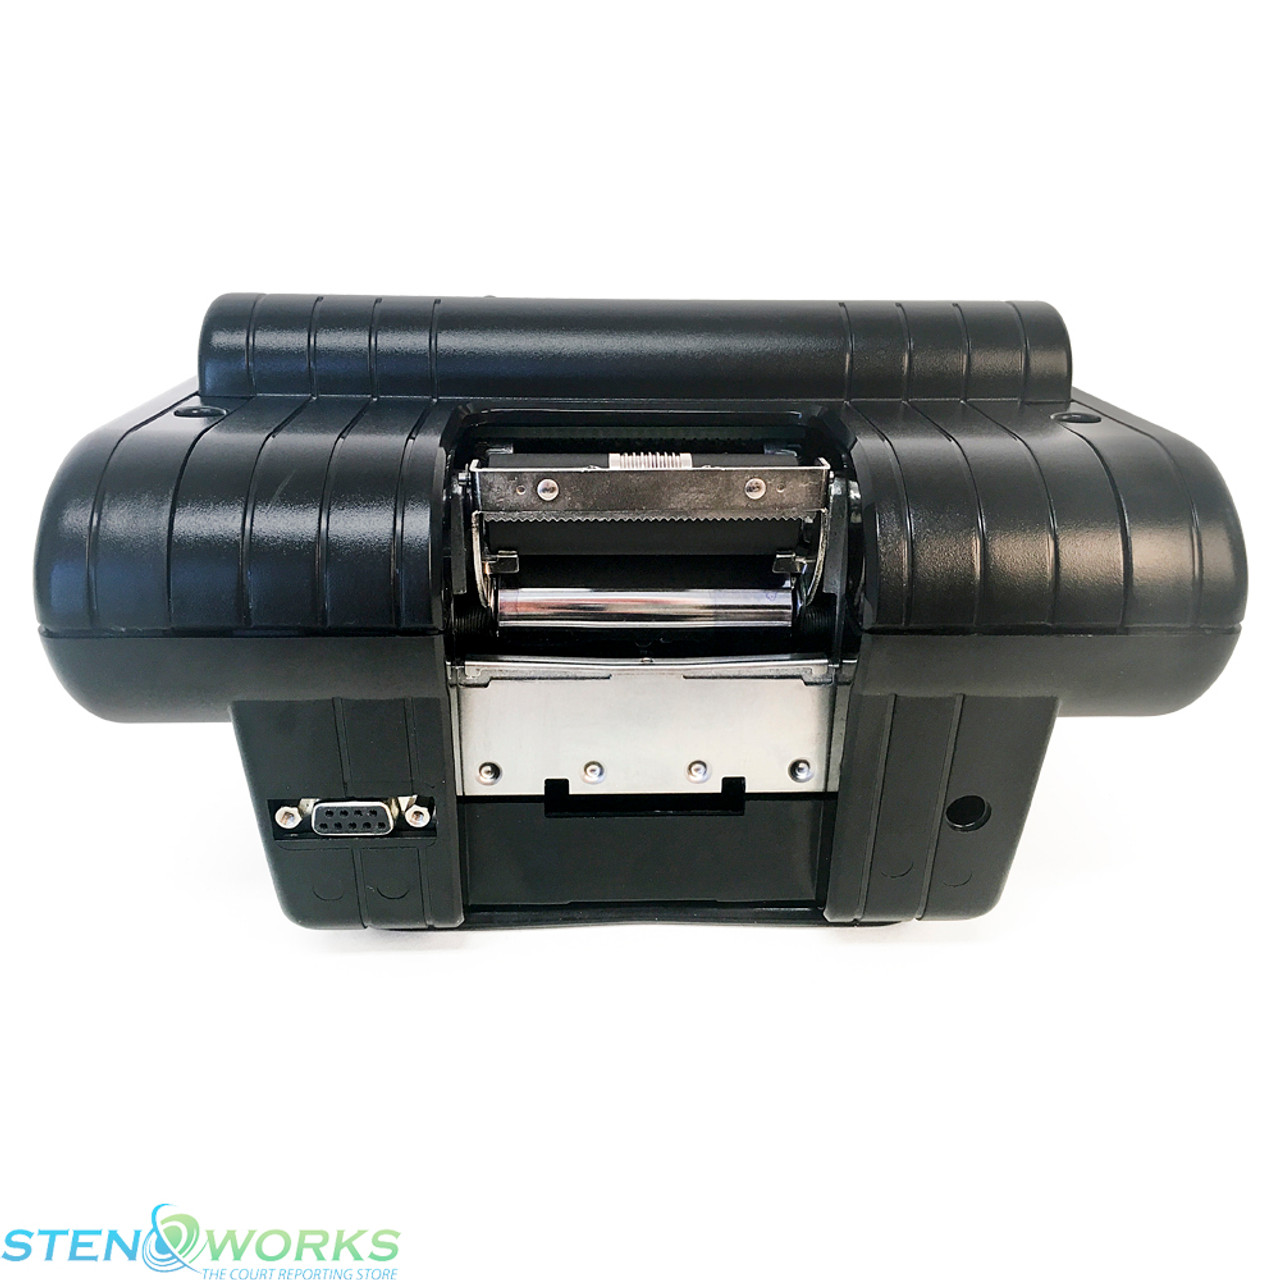 Stentura 400 SRT Electric Stenograph Stenography with Case /& Accessories 400SRT